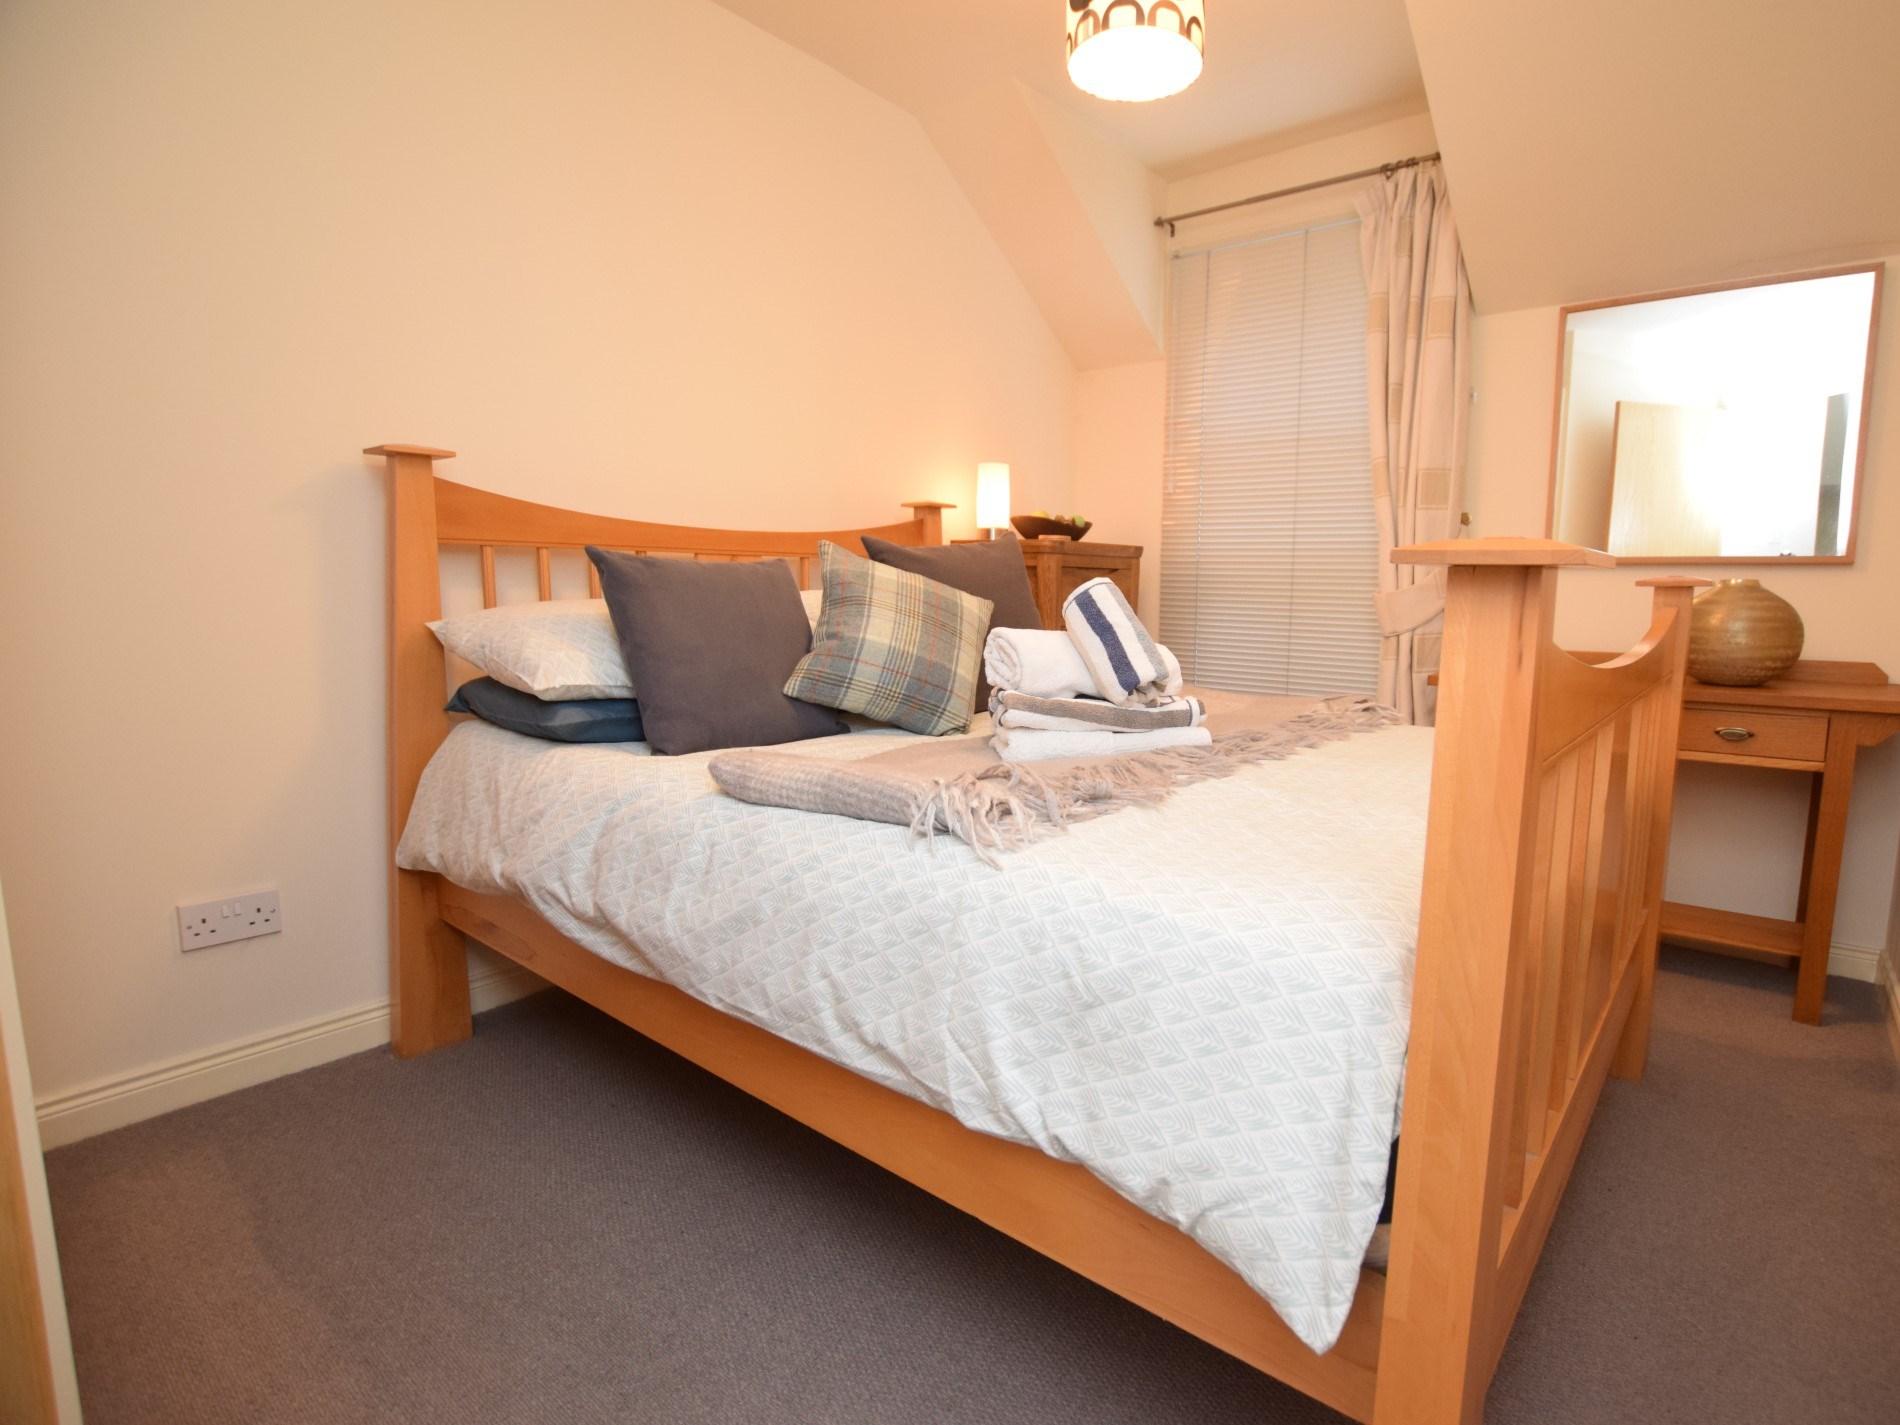 2 Bedroom Cottage in Edinburgh, Perthshire, Angus & Fife